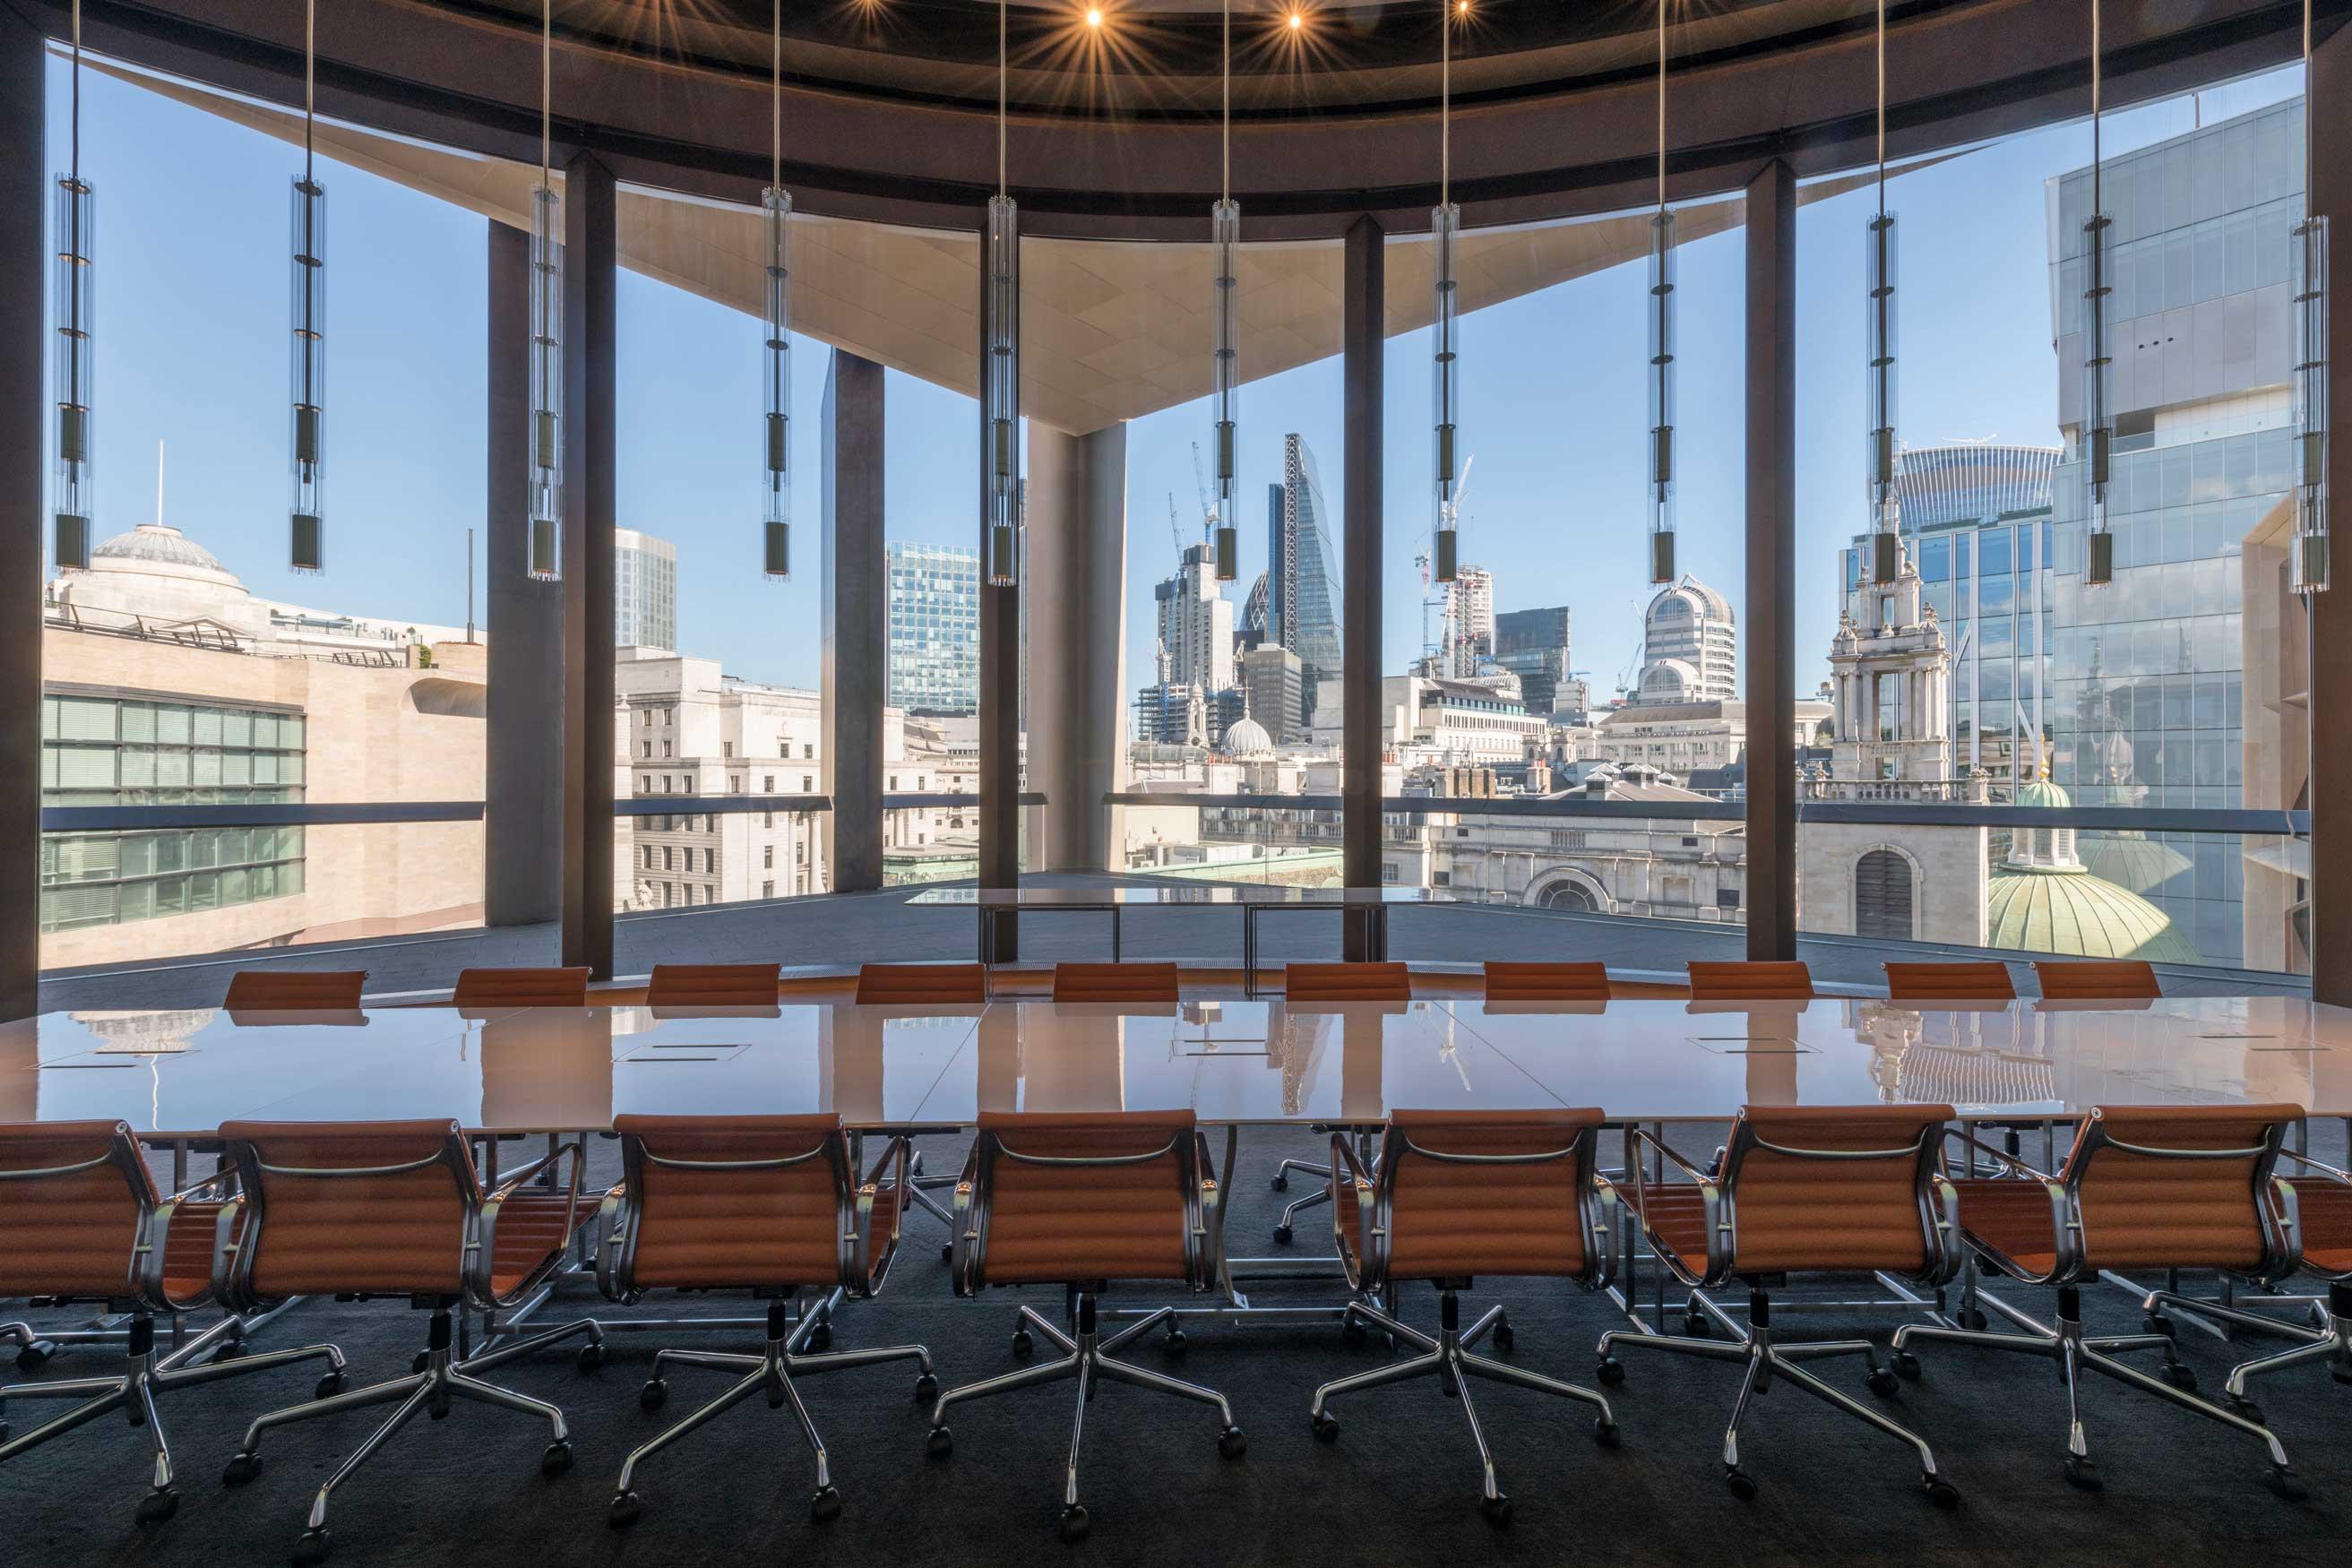 Bloomberg European HQ Workplace - Views